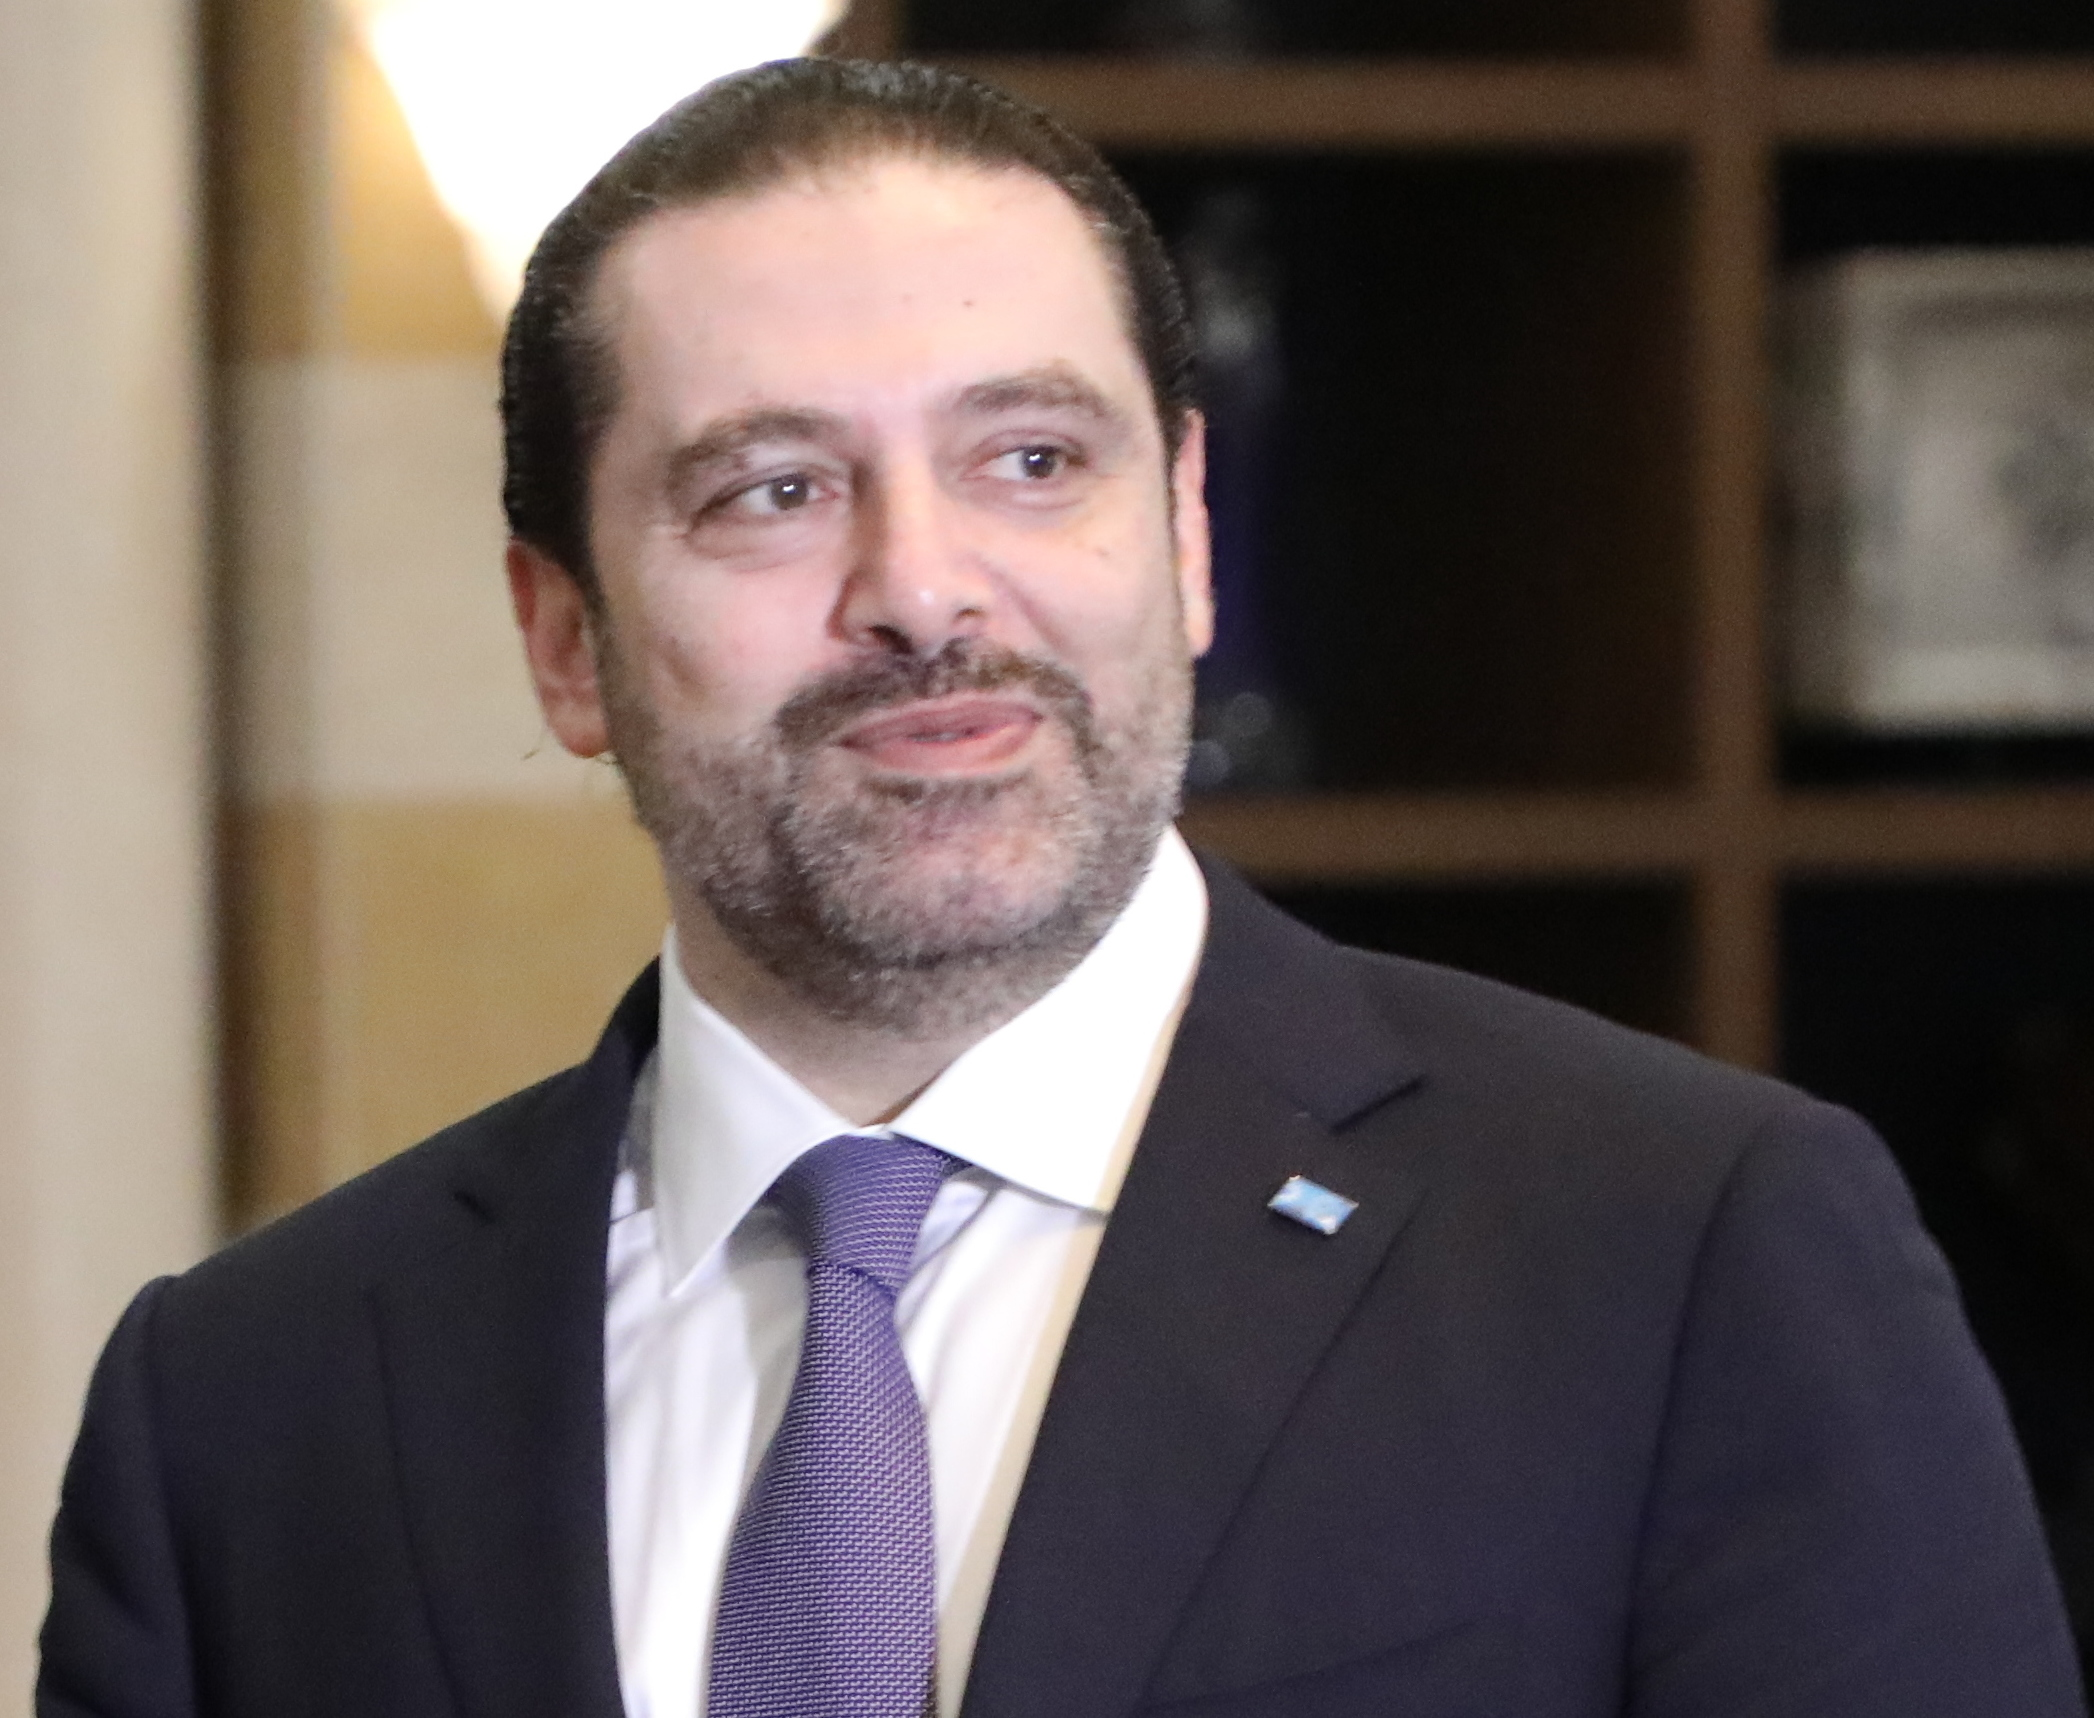 Lebanon caretaker PM Hariri says new govt to deal with Eurobonds -media